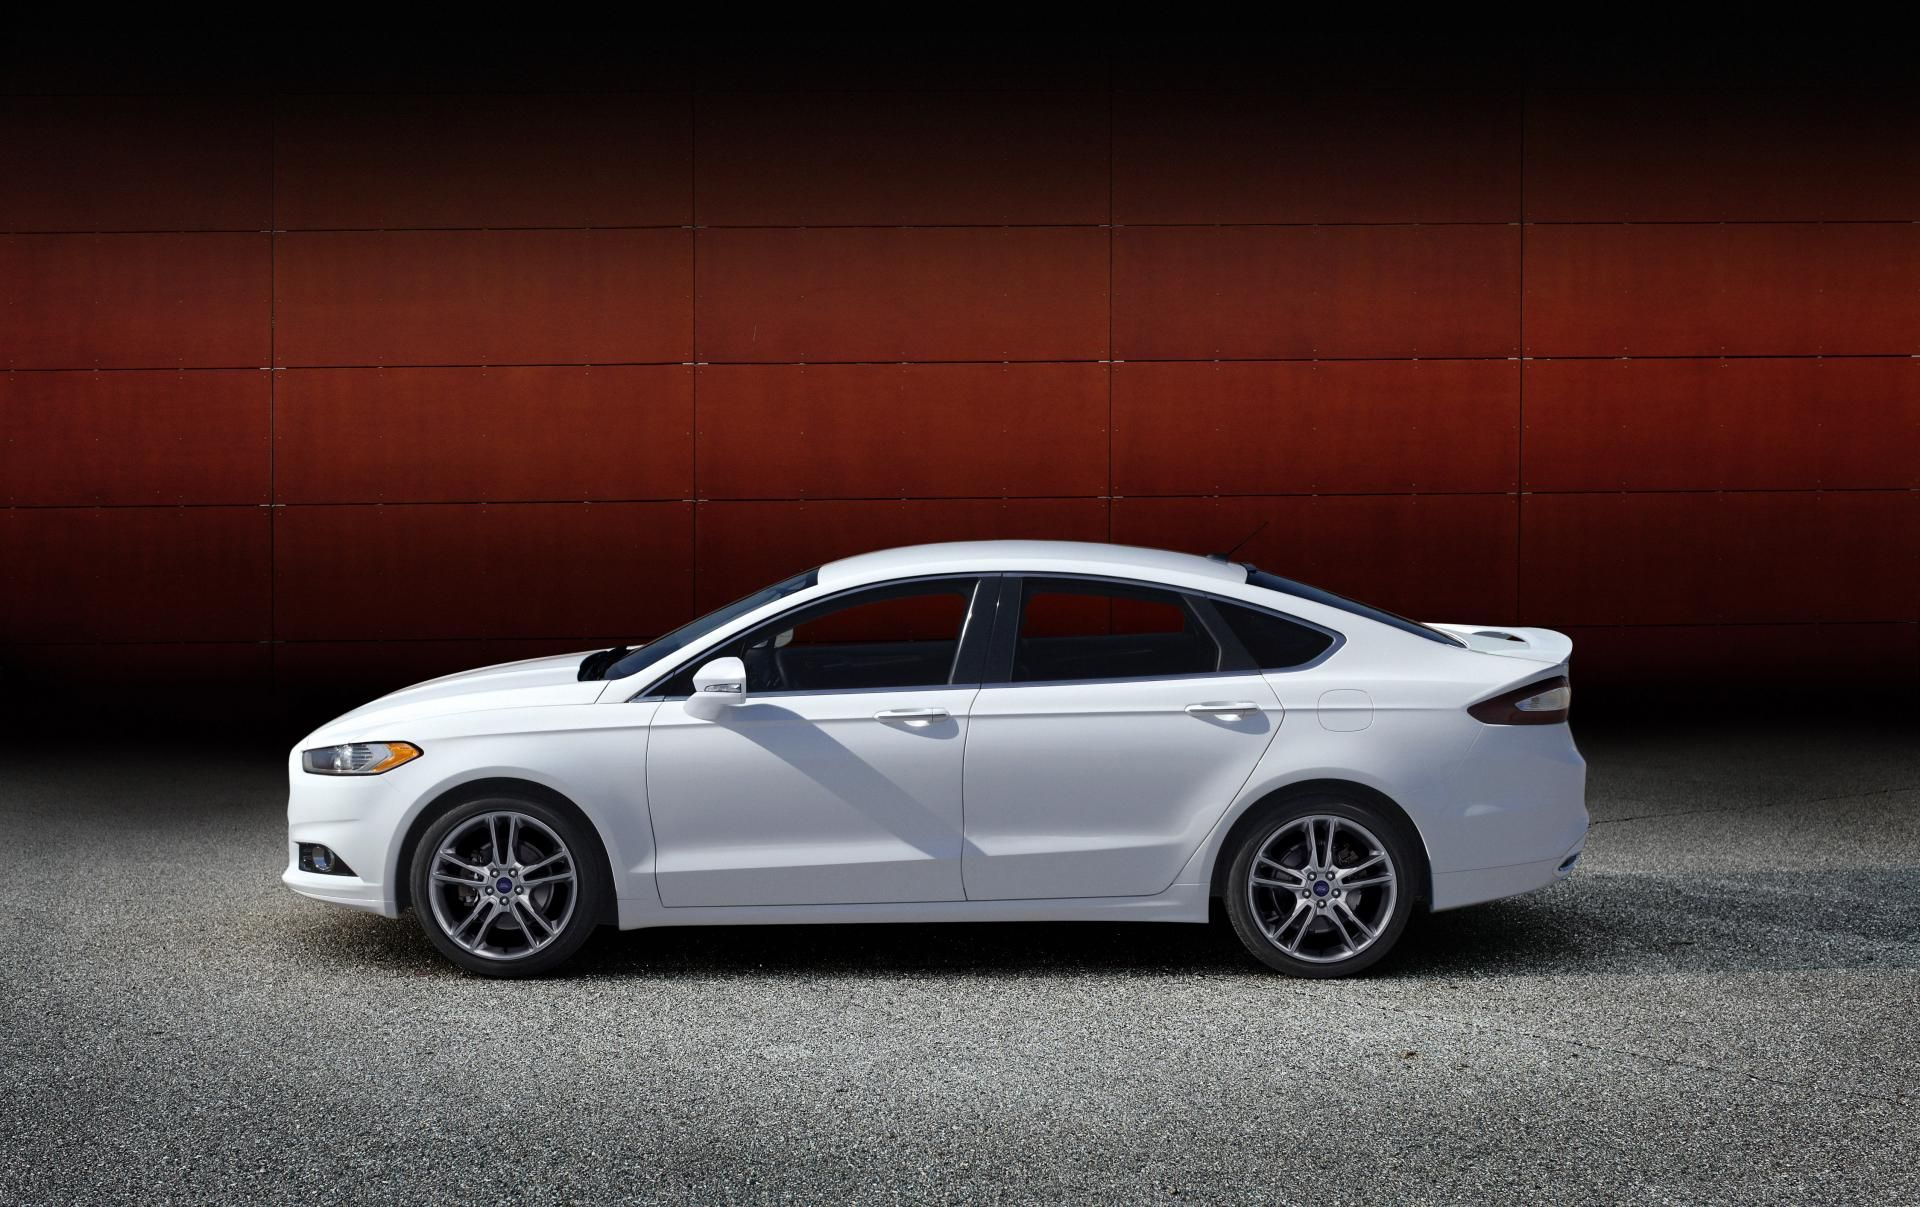 Ford fusion sedan side view